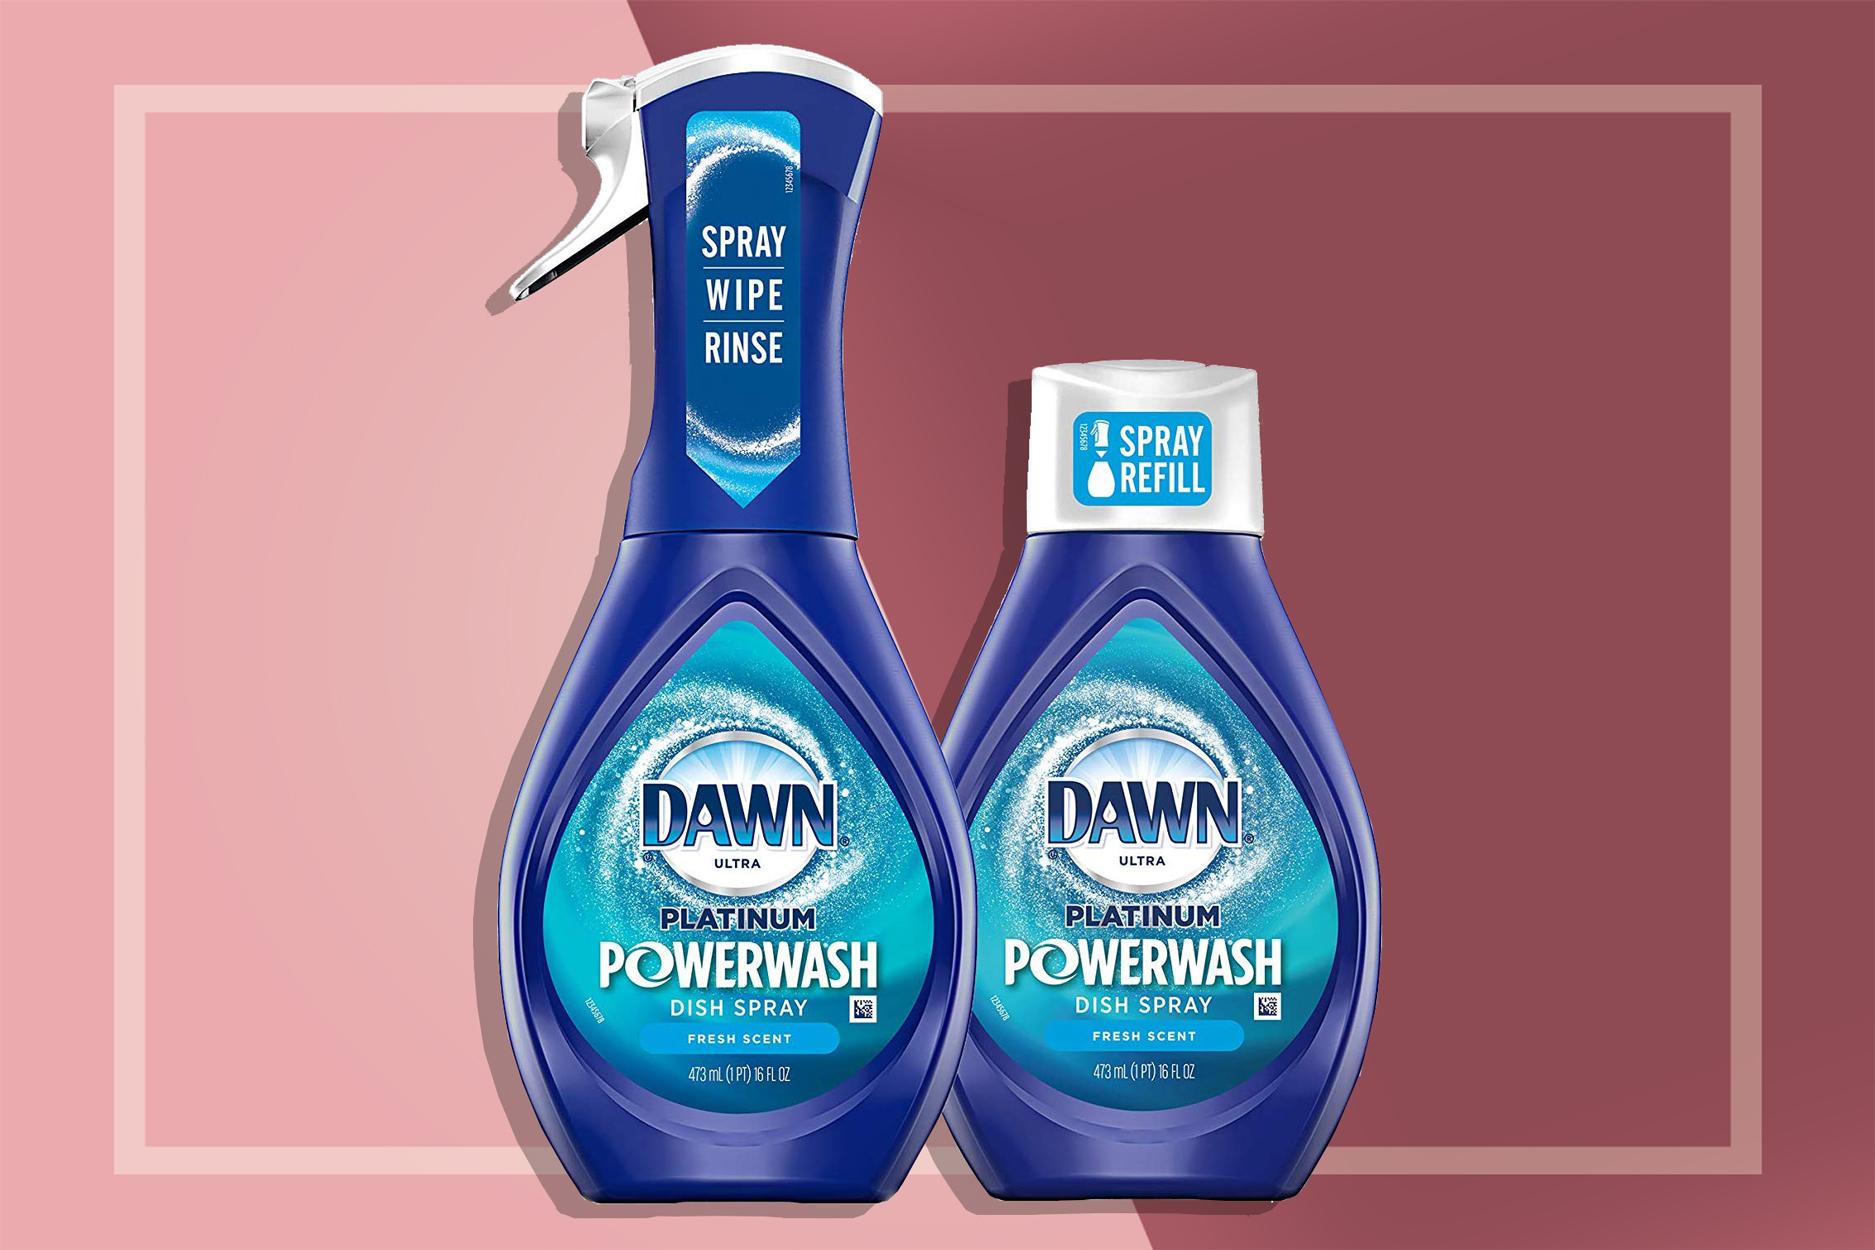 Dawn Platinum Powerwash Dish Spray, Dish Soap